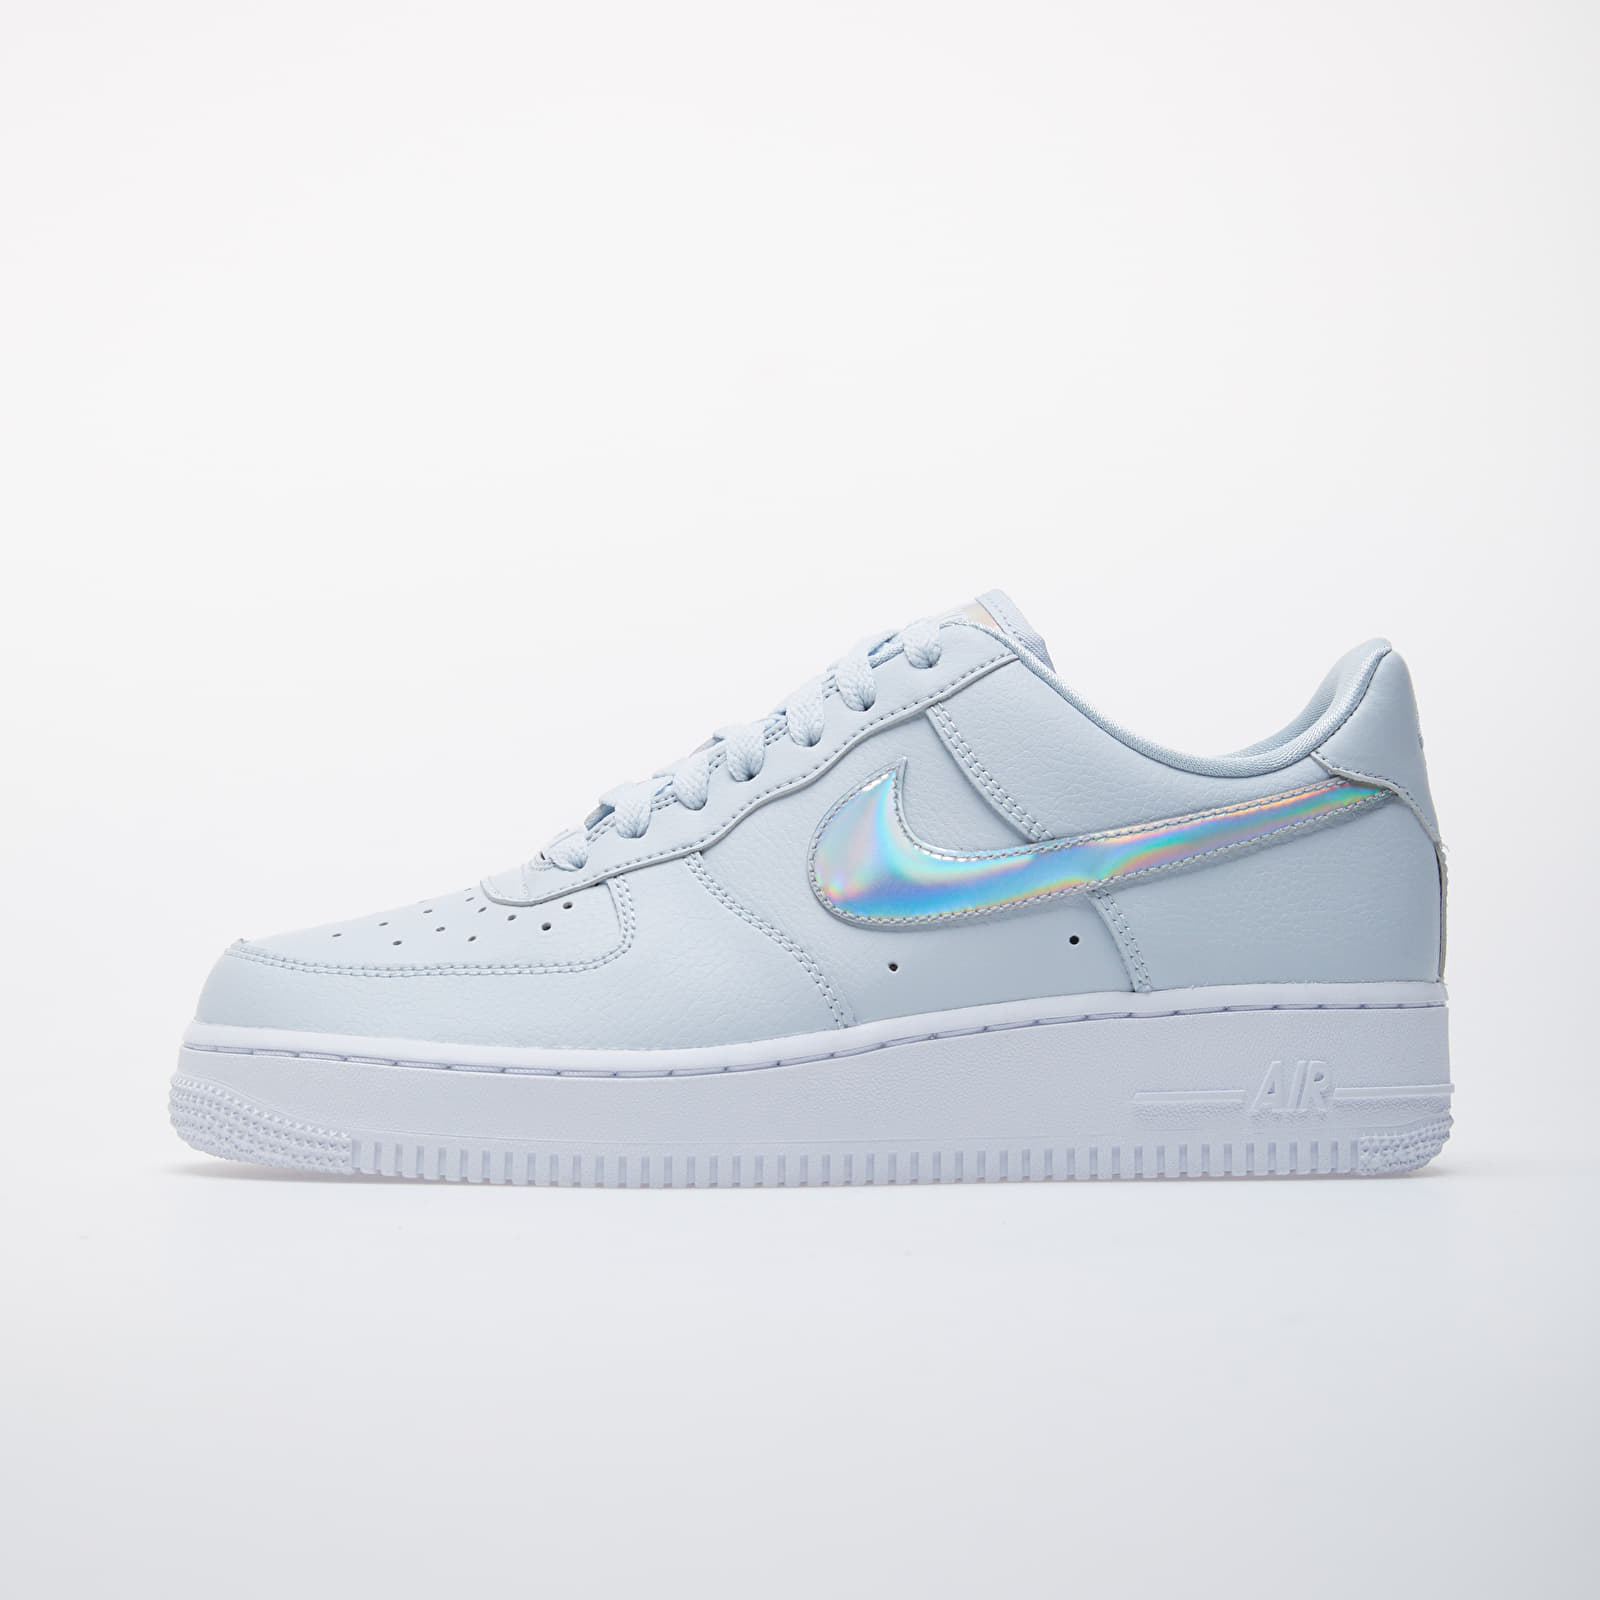 nike air force 1 '07 essential chaussures femme blanc